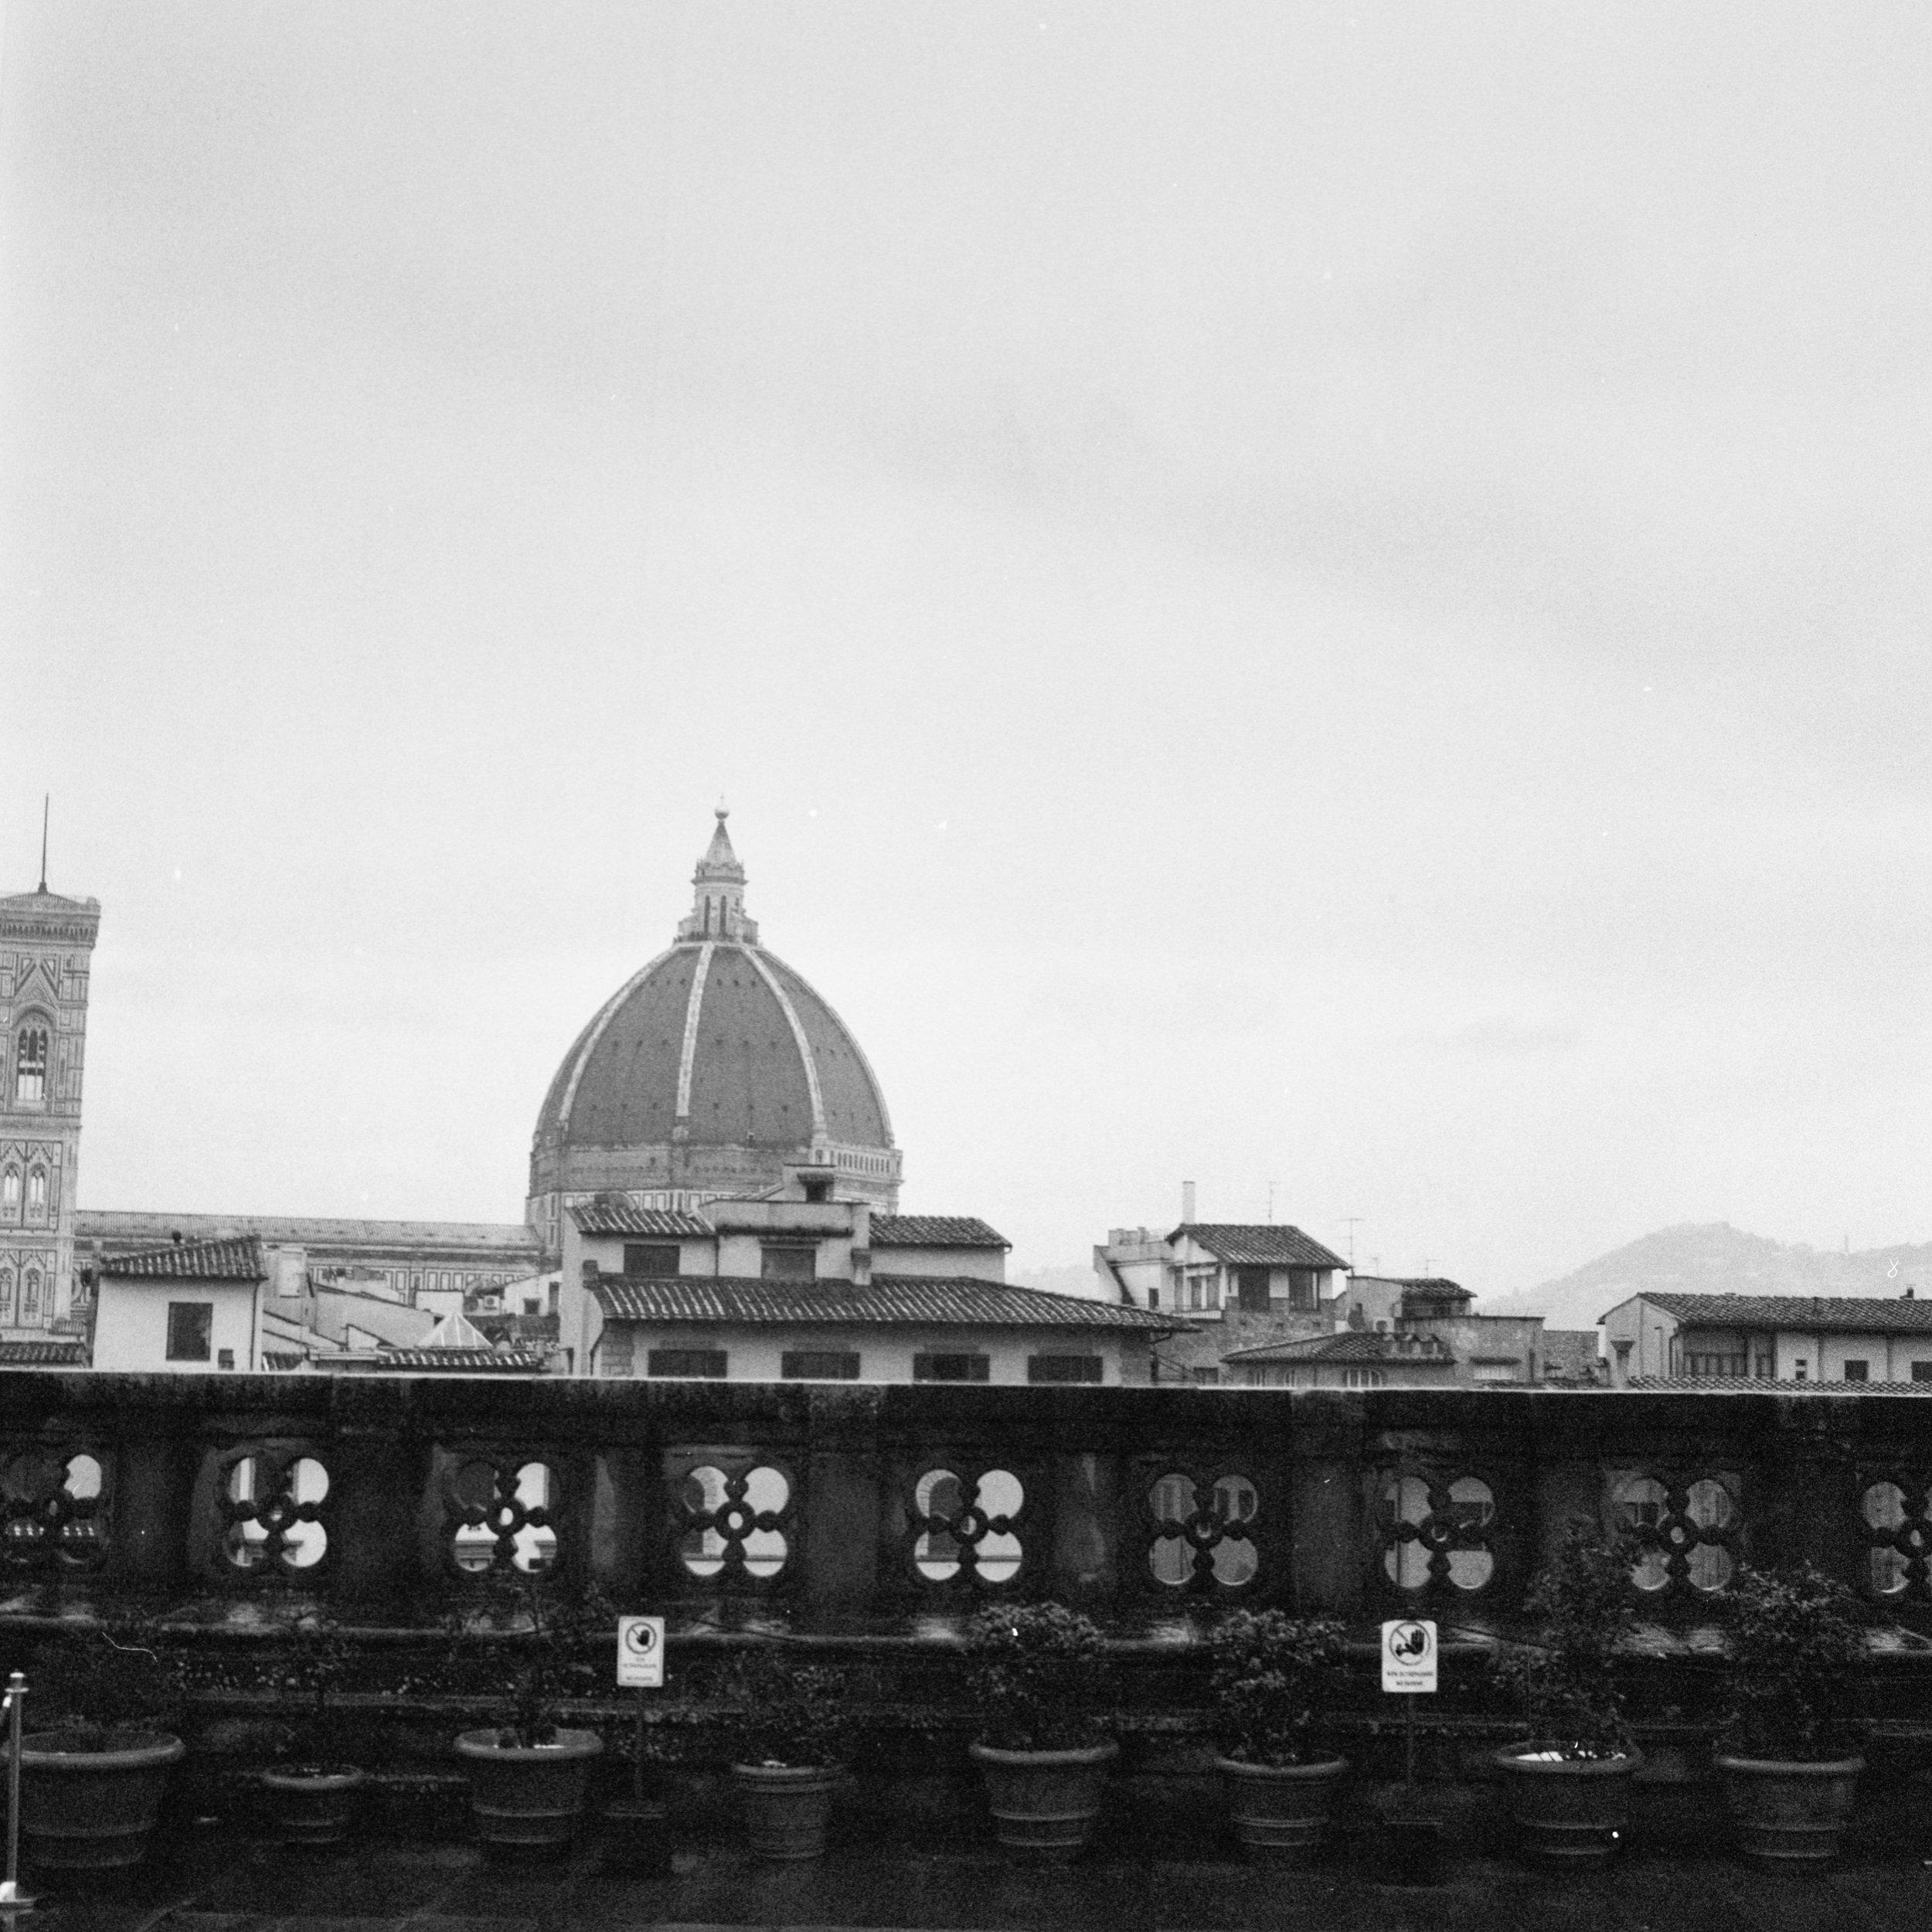 Brunelleschi's Dome Hasselblad 501c | Bergger Pancro 400